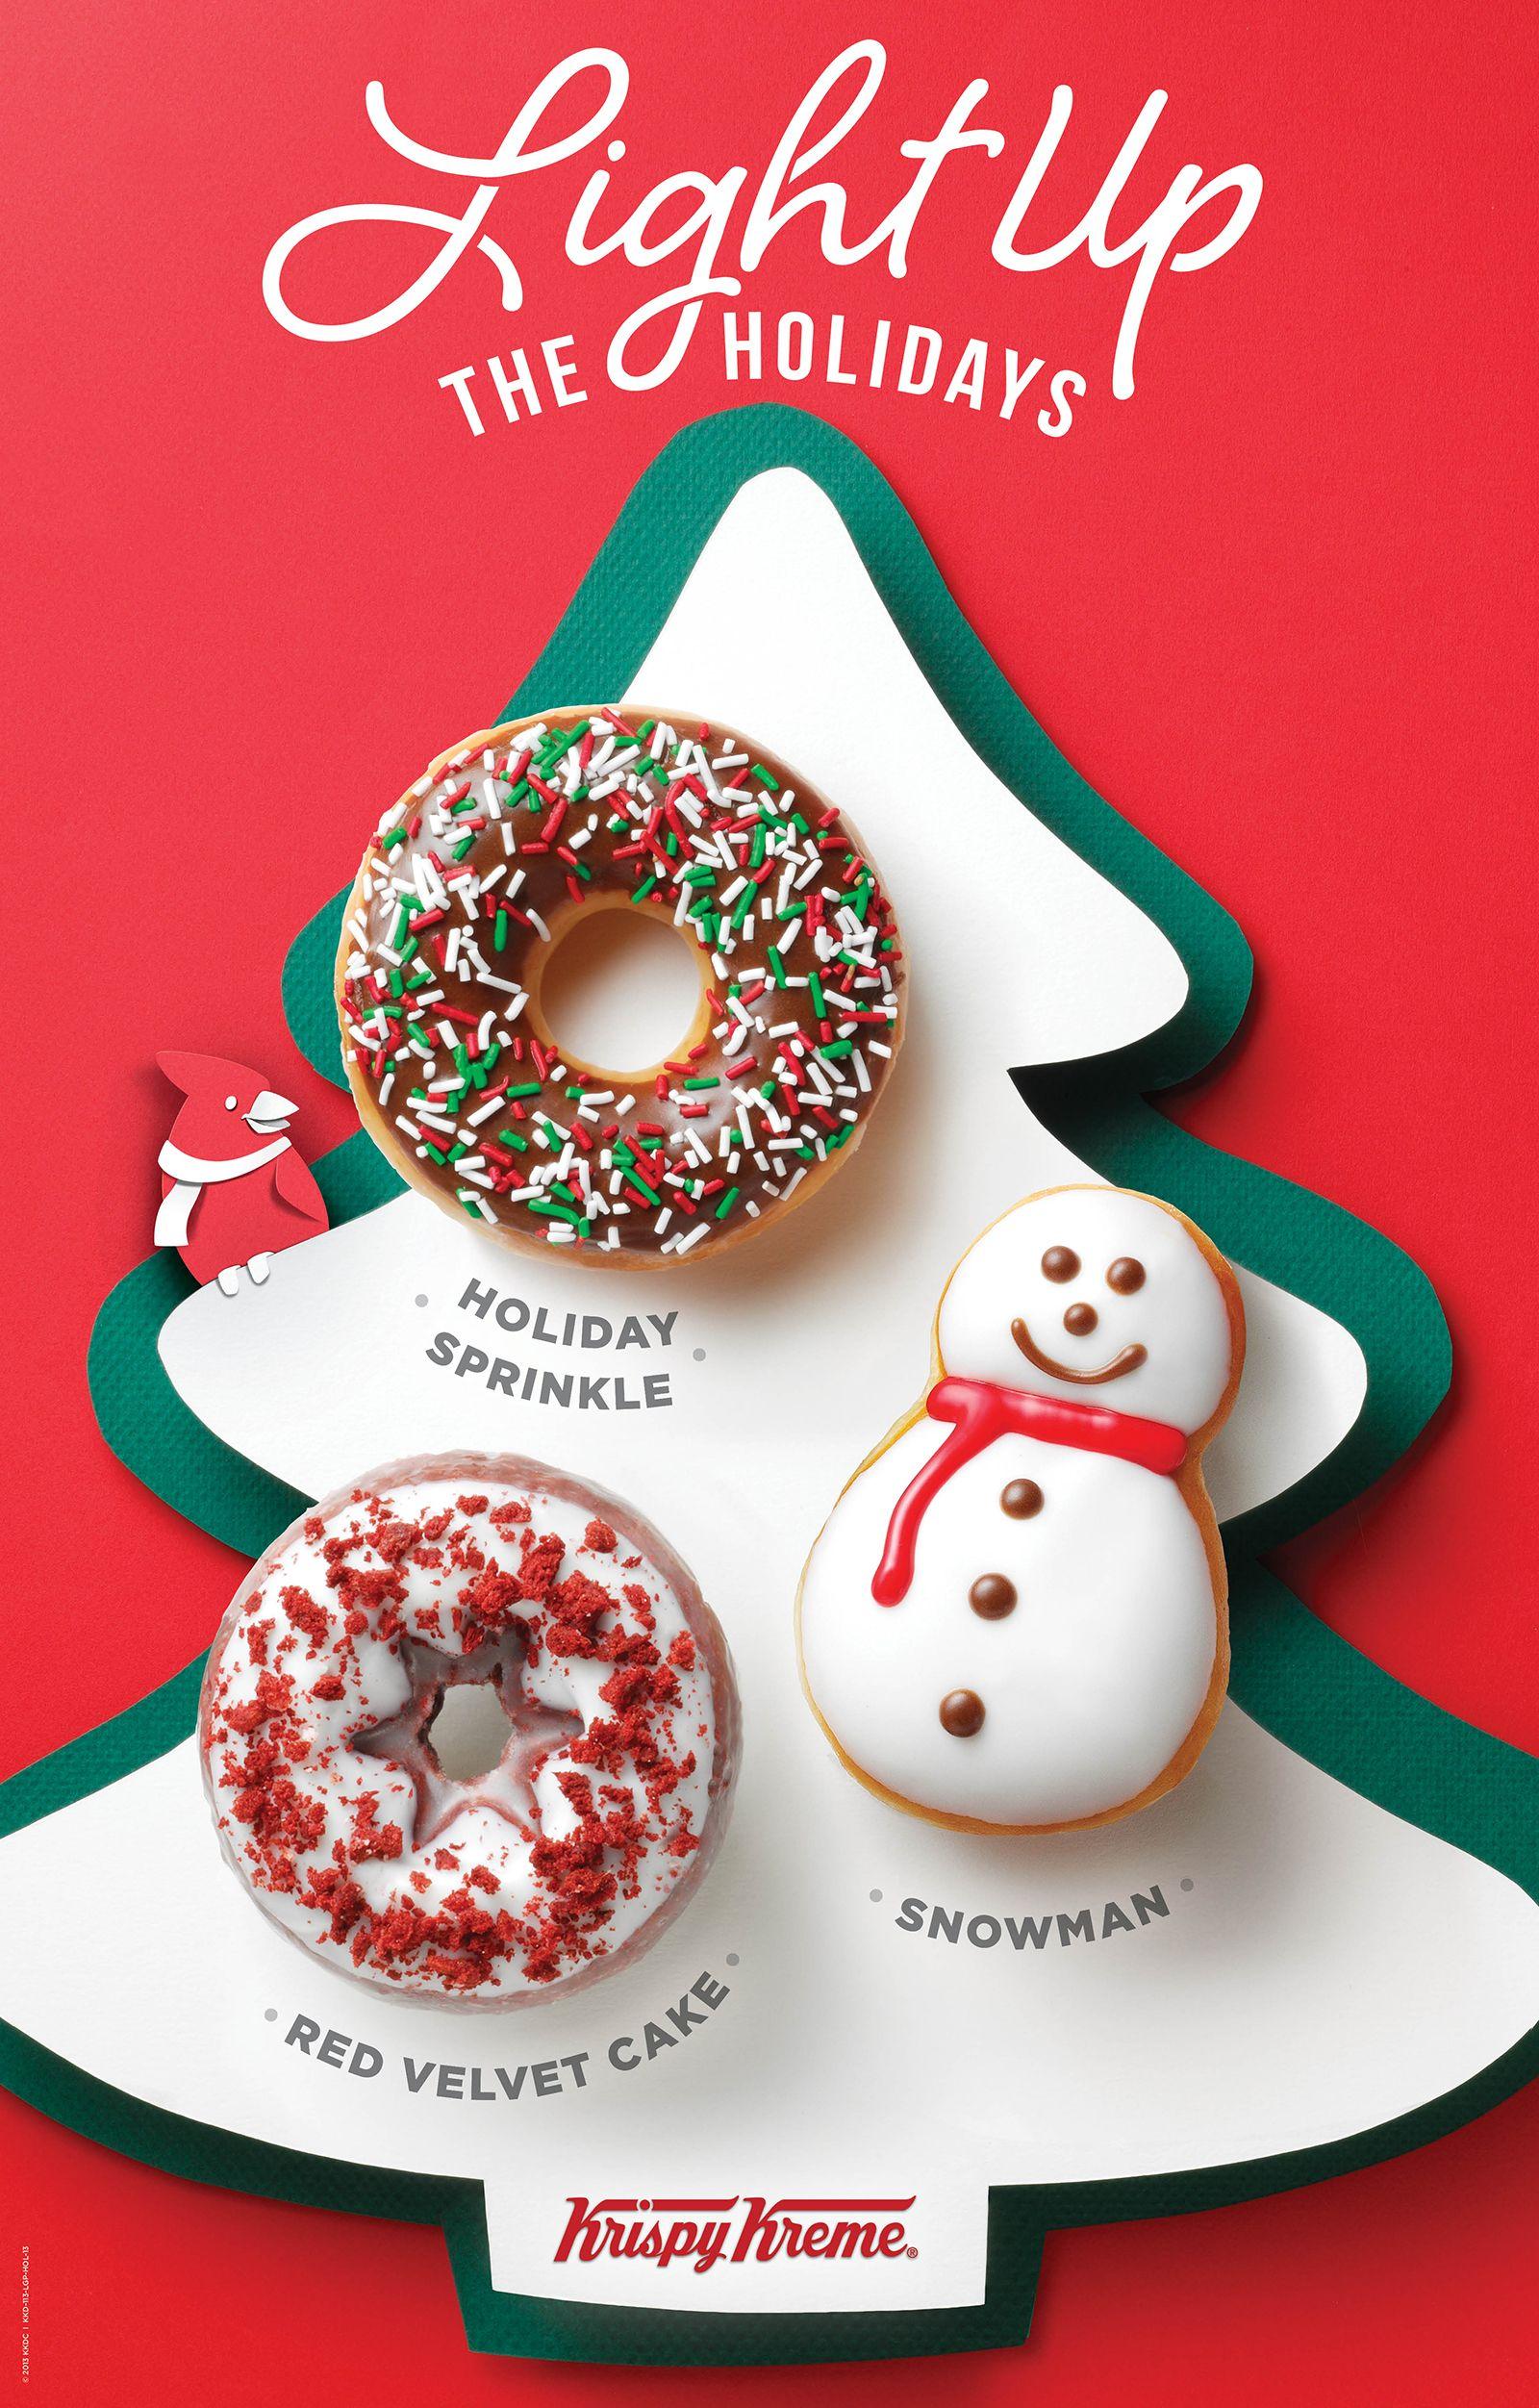 light up the holidays by visiting krispy kreme - Krispy Kreme Christmas Hours